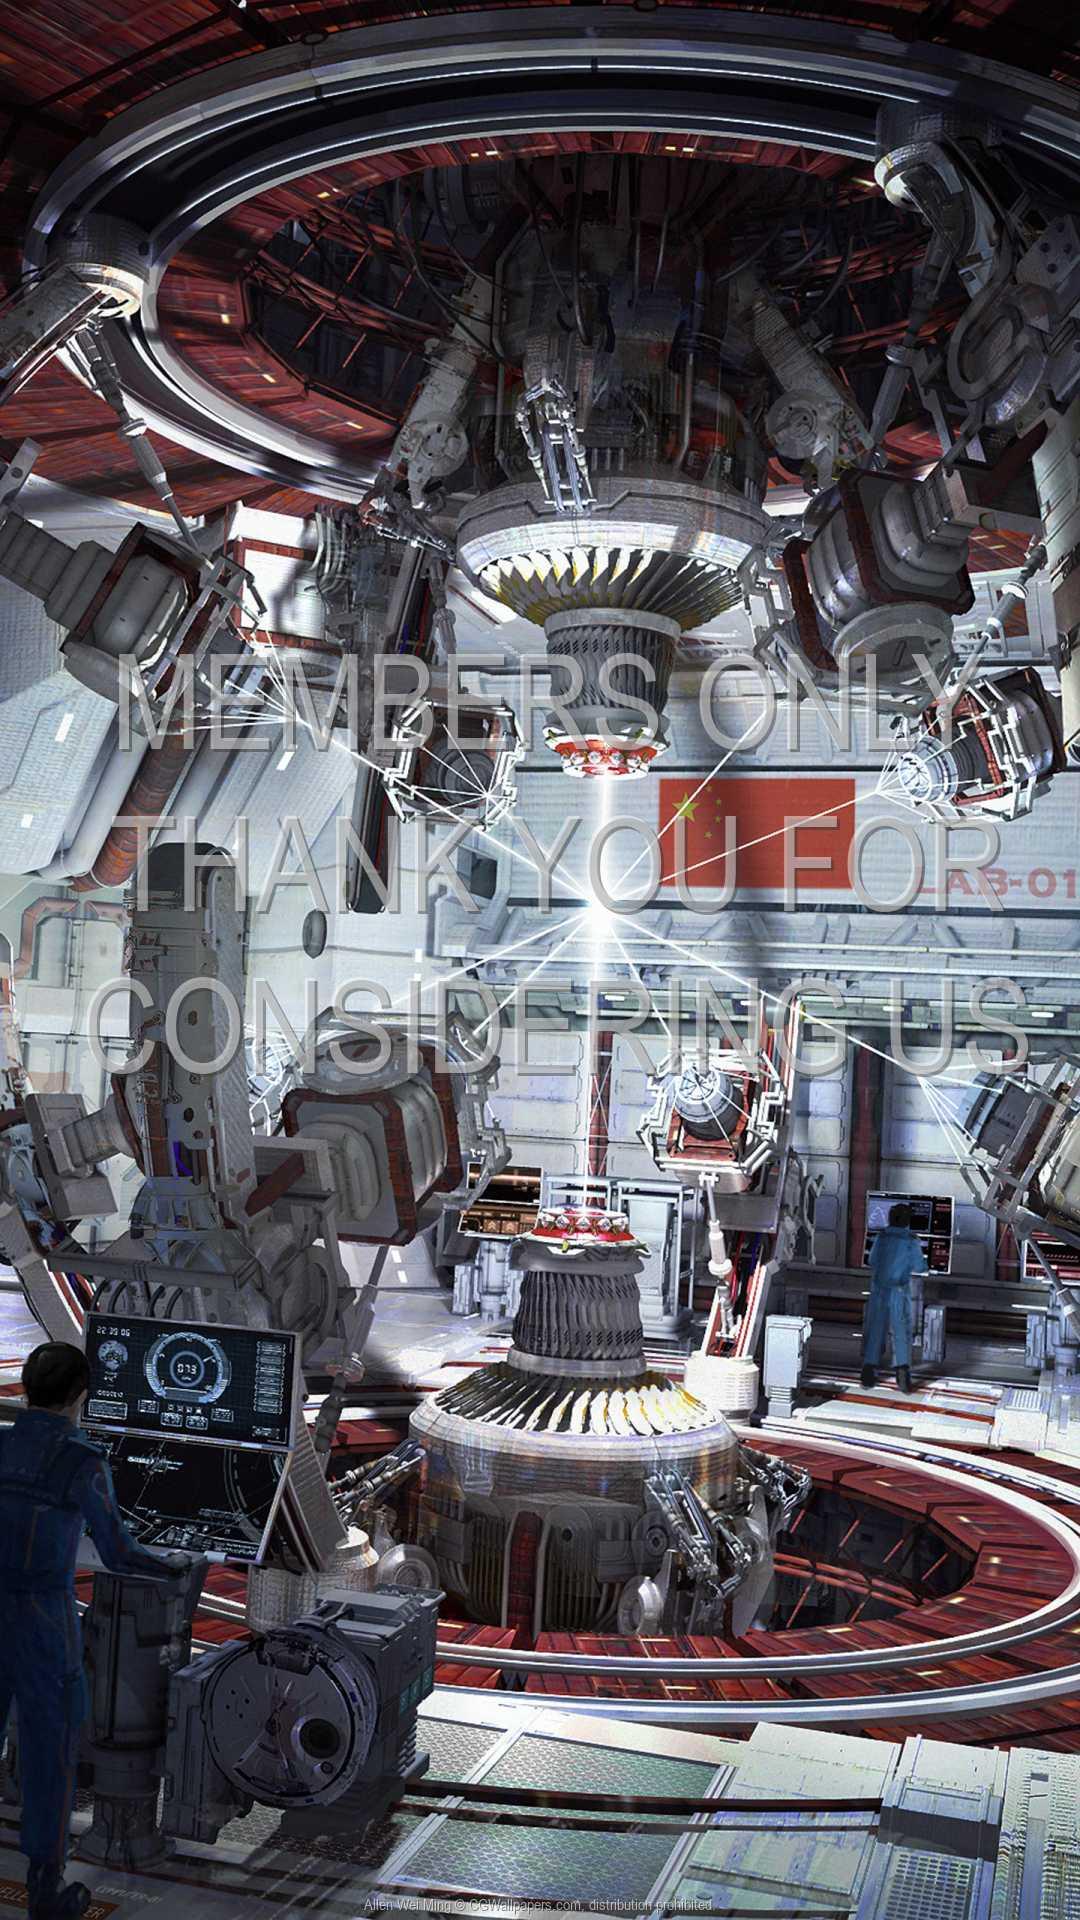 Allen Wei Ming 1080p Vertical Mobile wallpaper or background 14